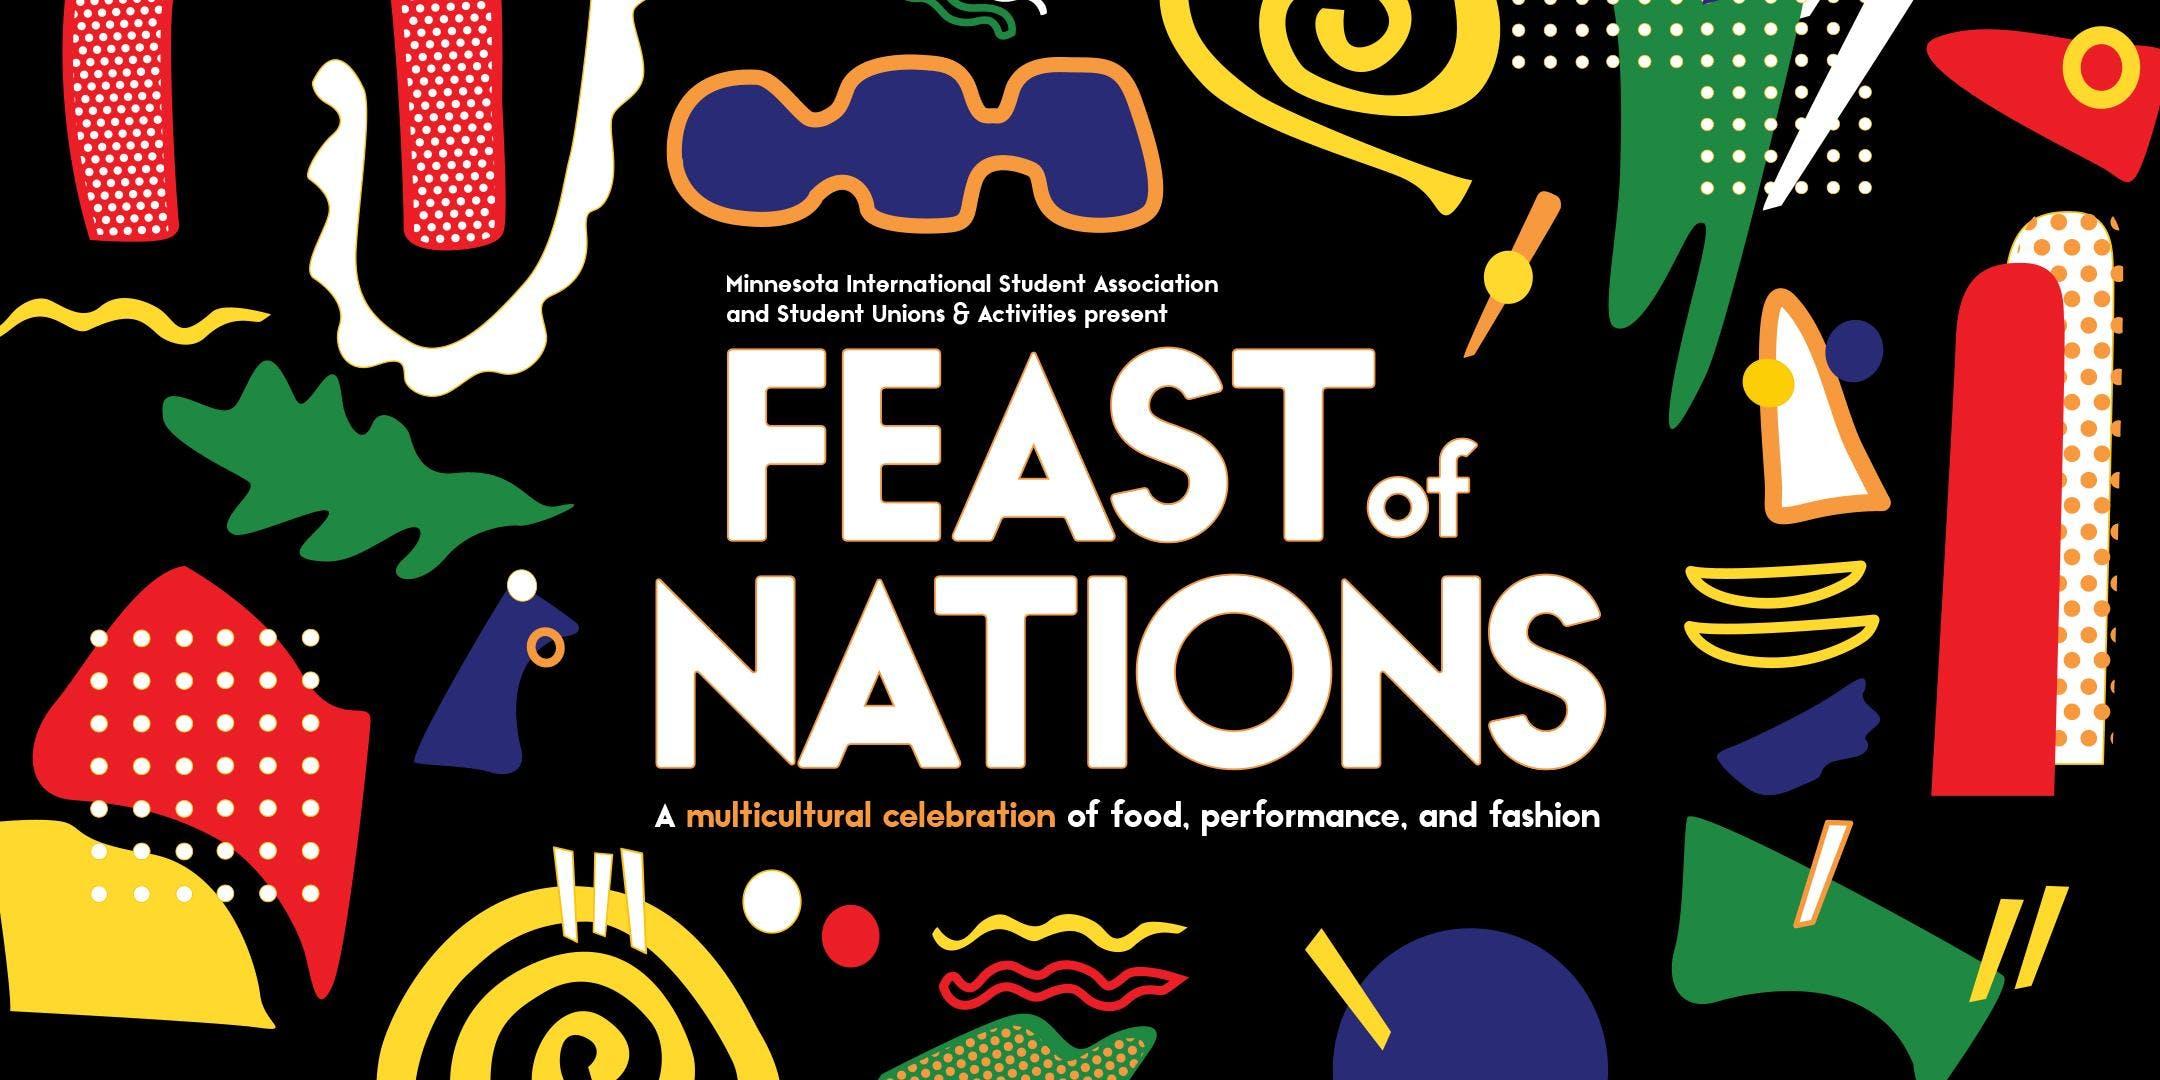 Feast clipart celebration. Free download clip art